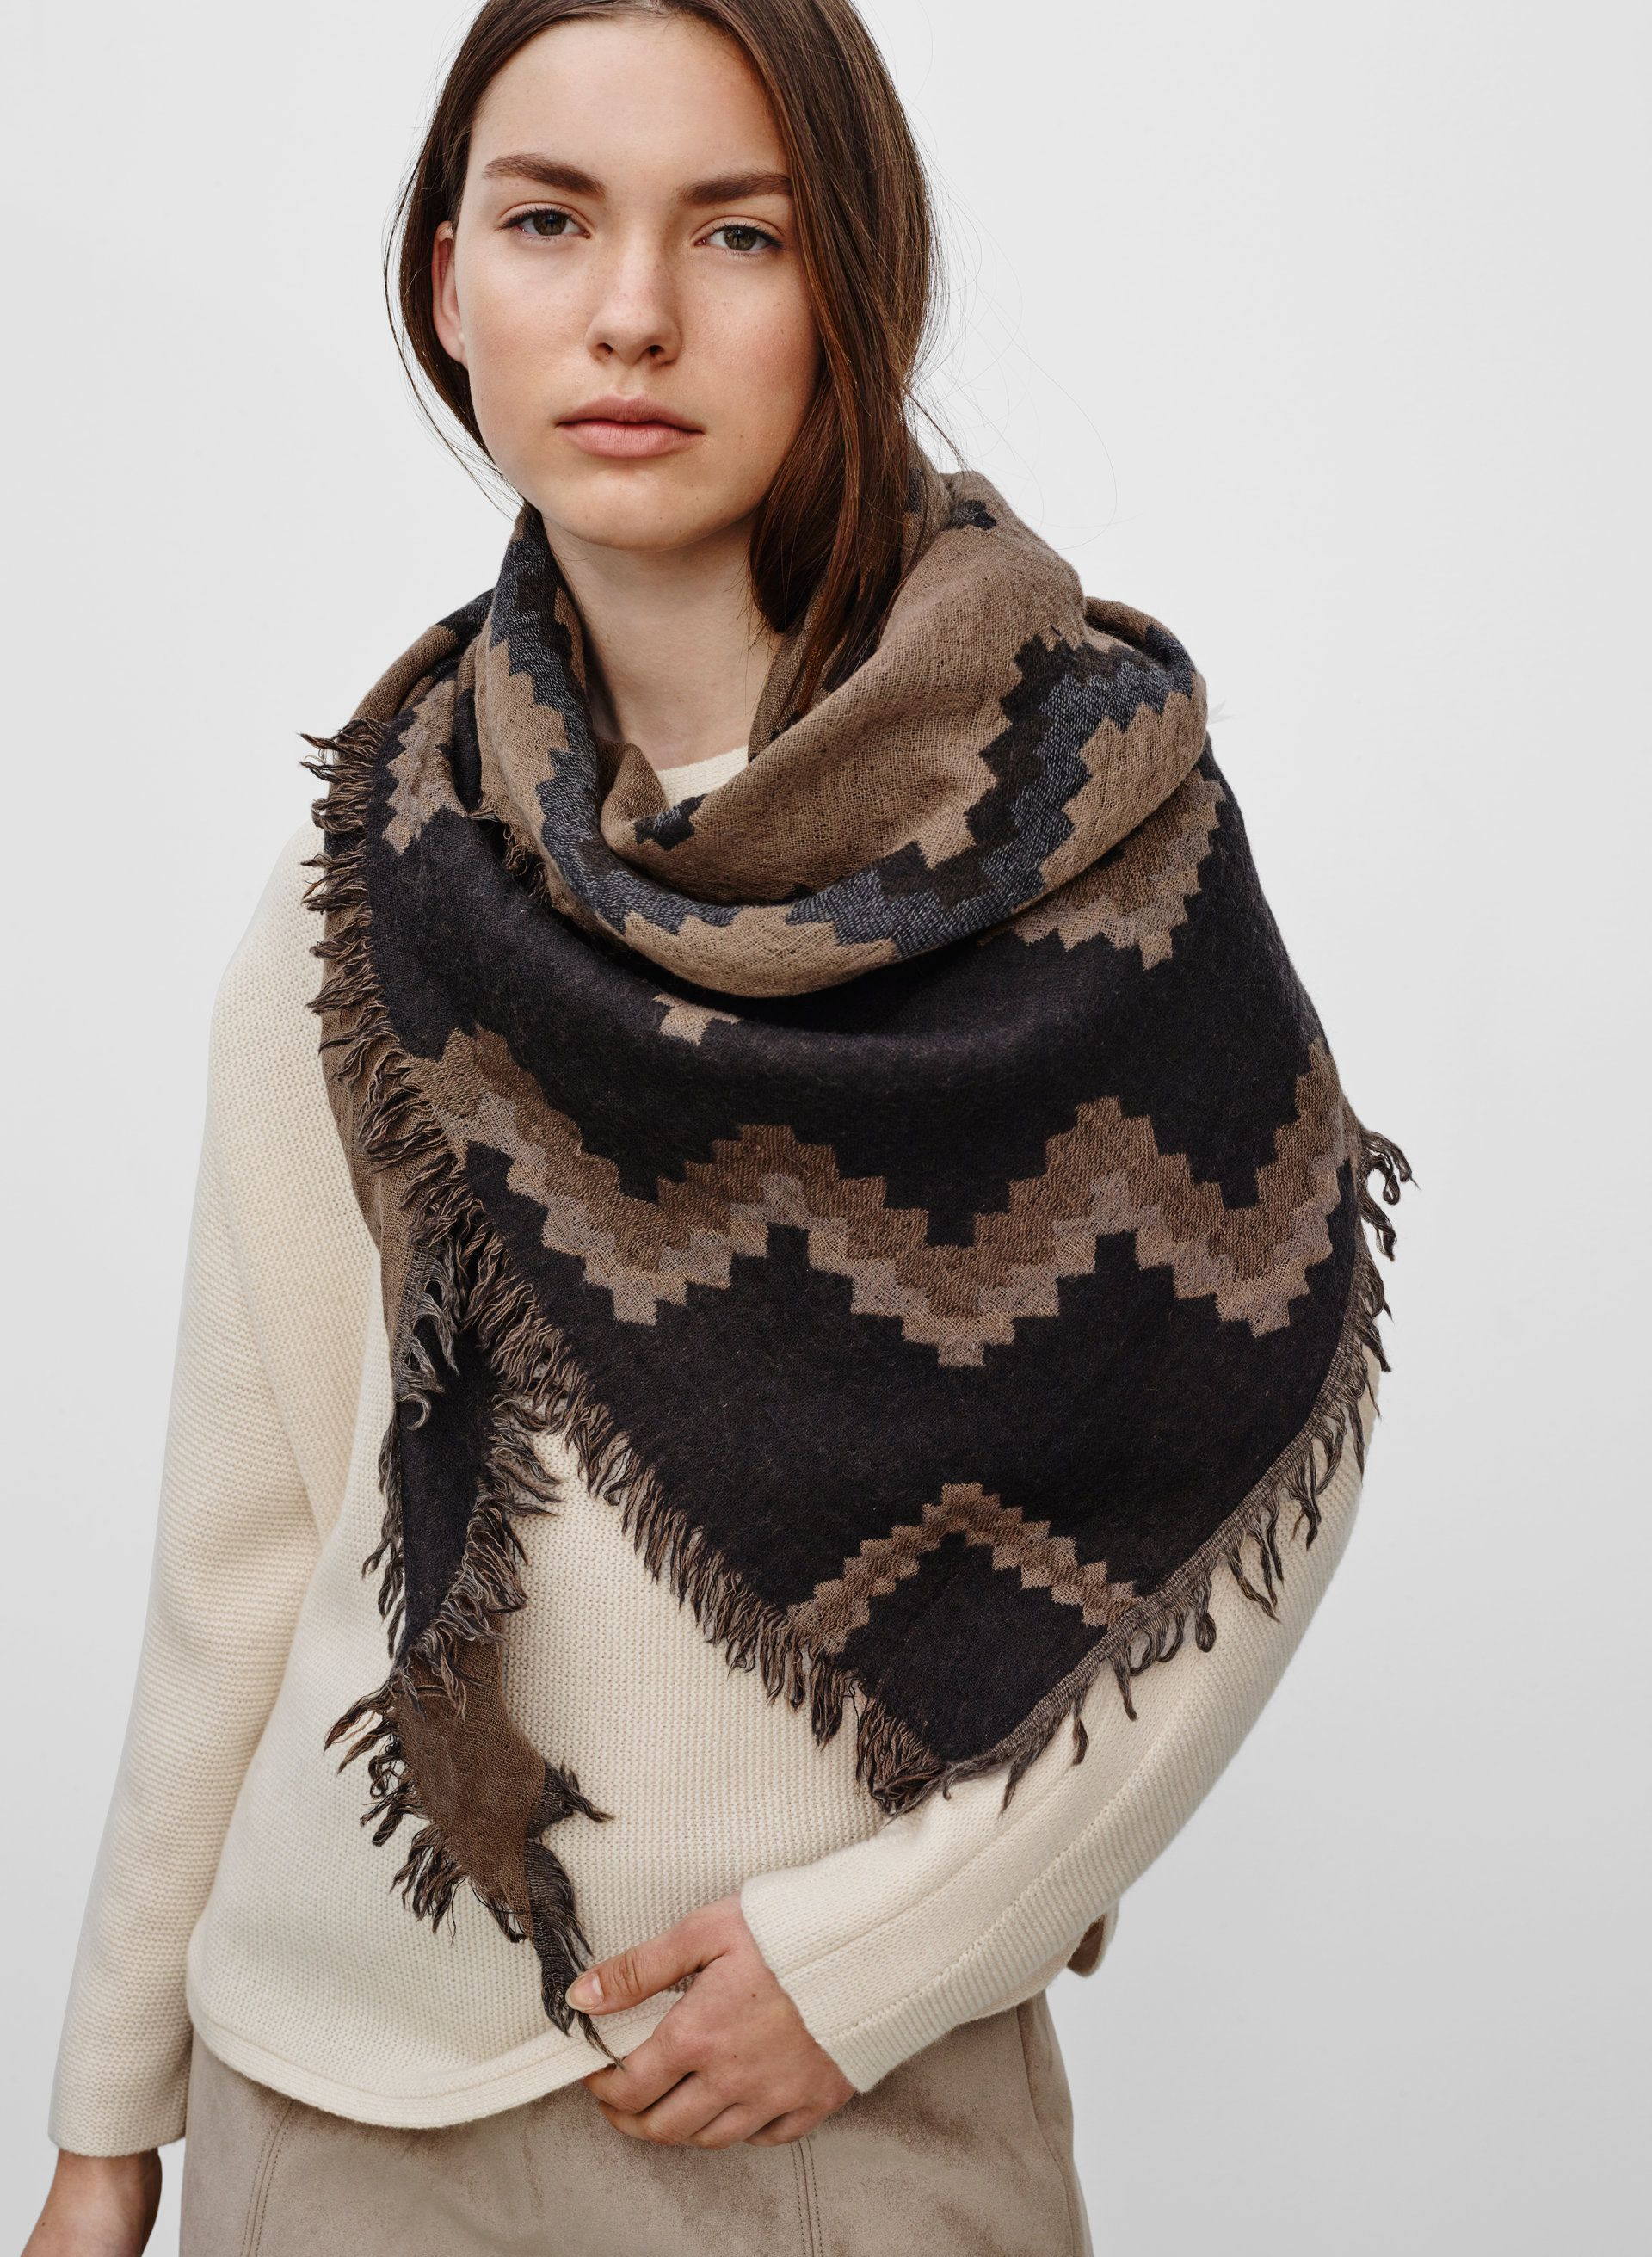 6e513182bdd98 Diamond mosaic scarf in 2019 | Fall fashion | Aritzia scarf ...